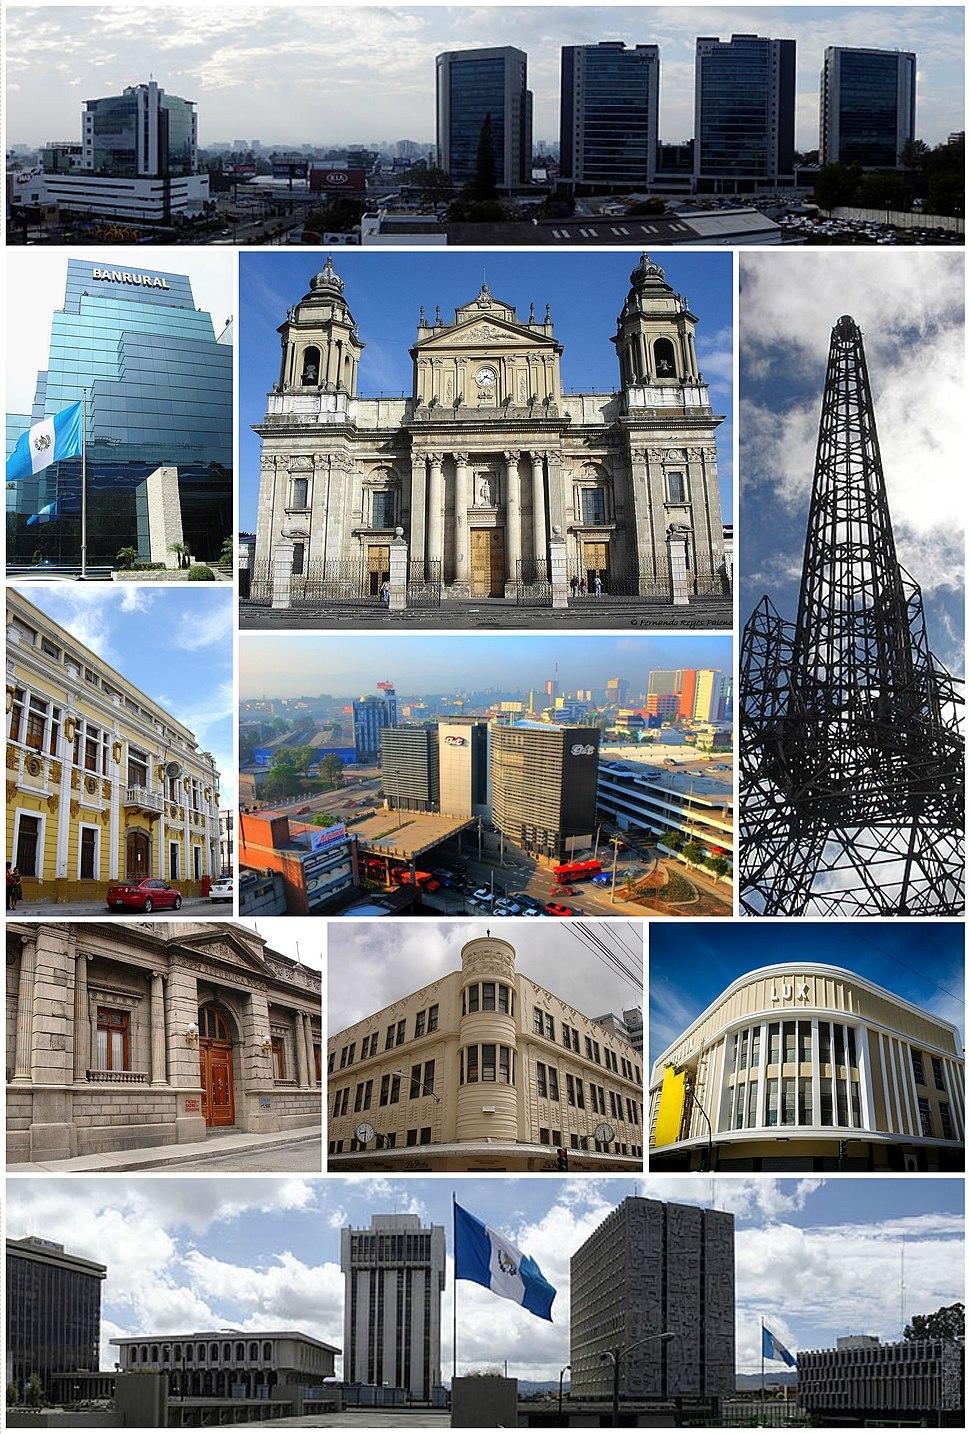 Collage of several city landmarks